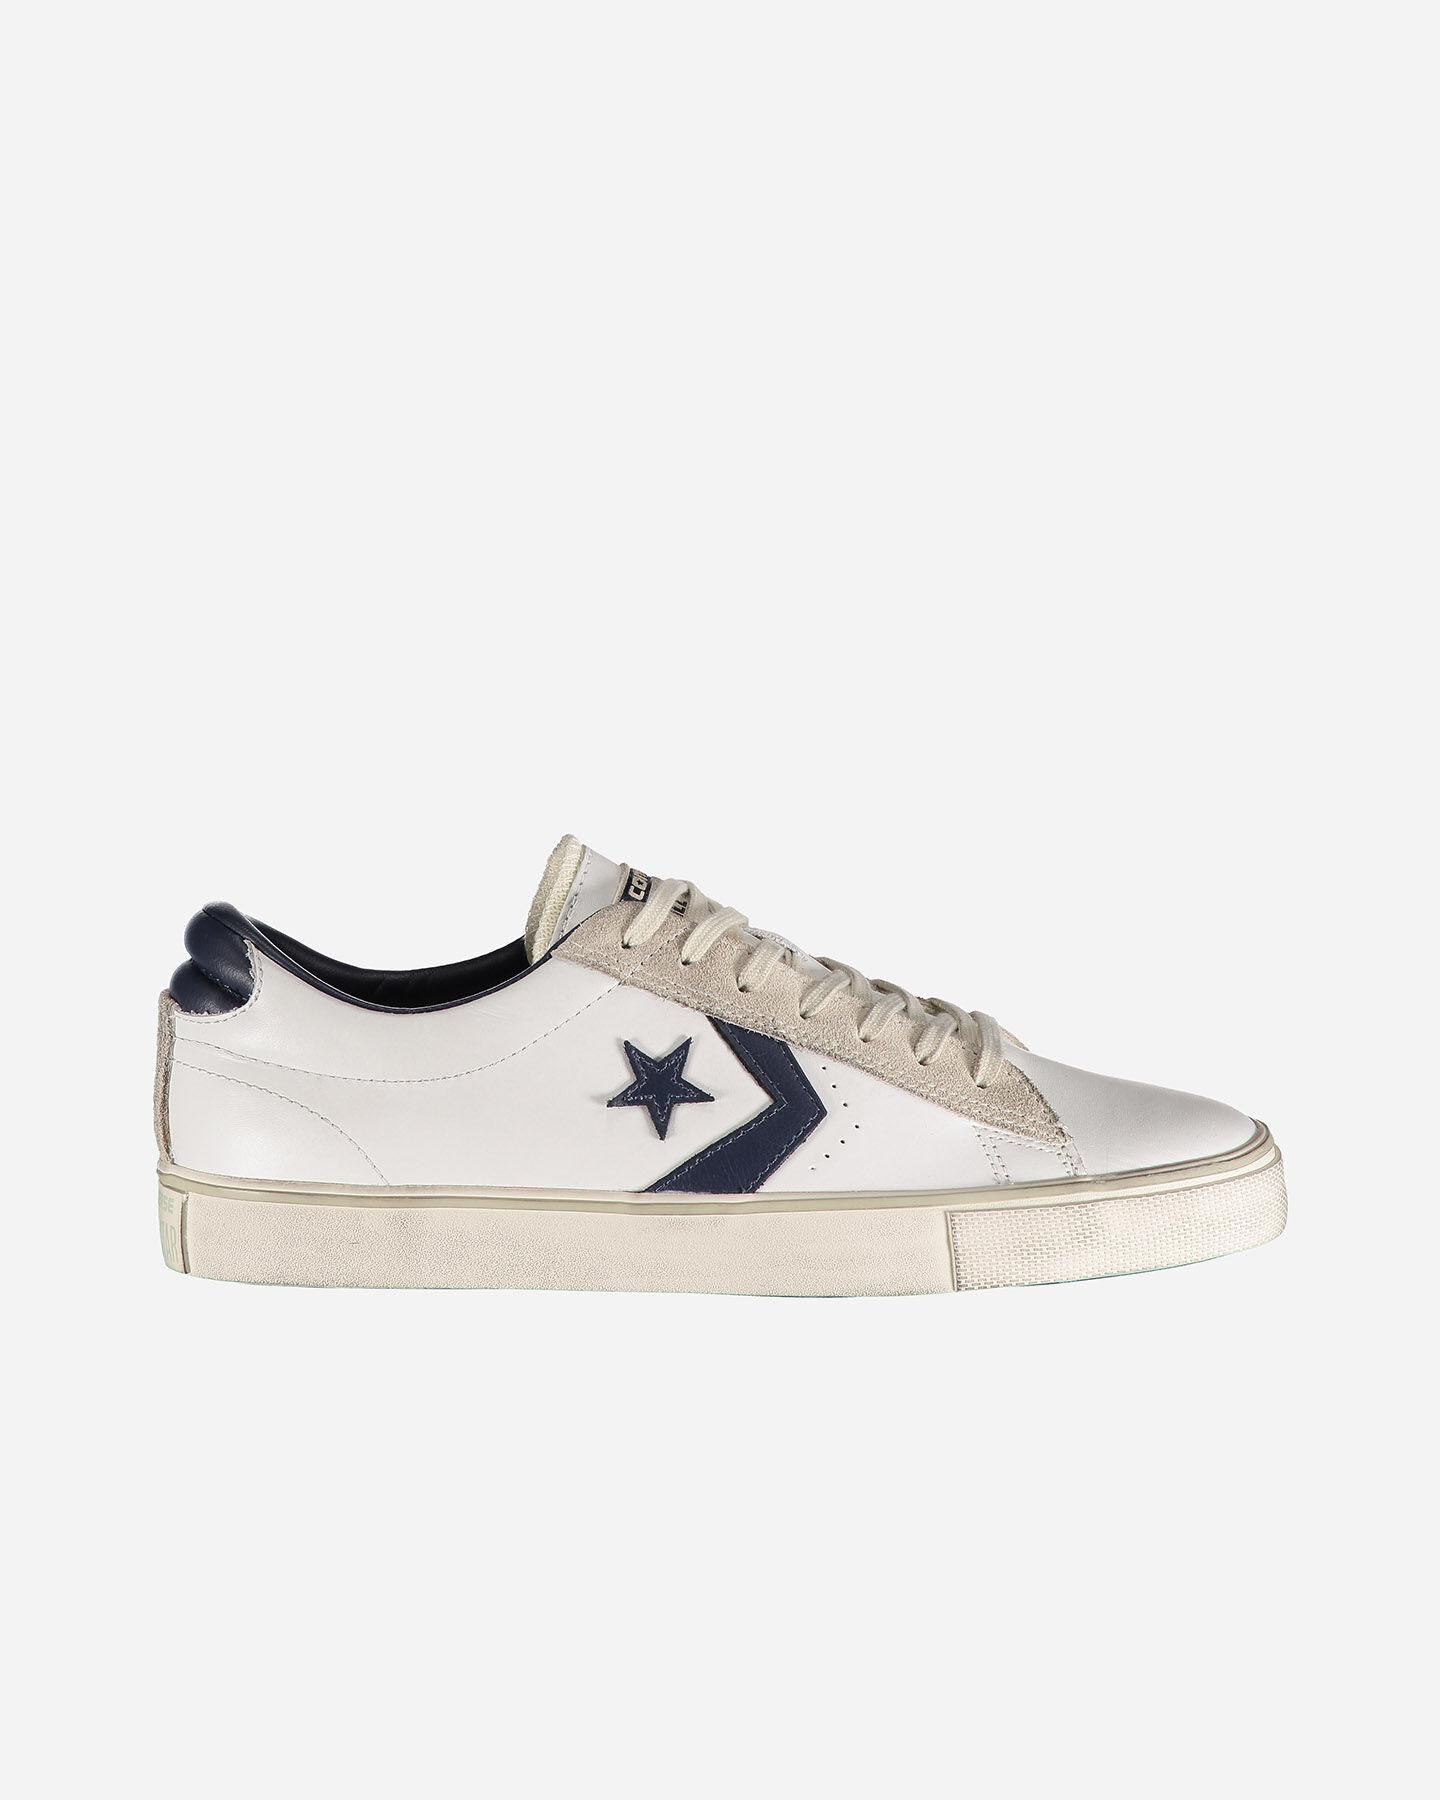 Scarpe Sneakers Converse Pro Leather Vulc Ox M 148457C | Cisalfa Sport